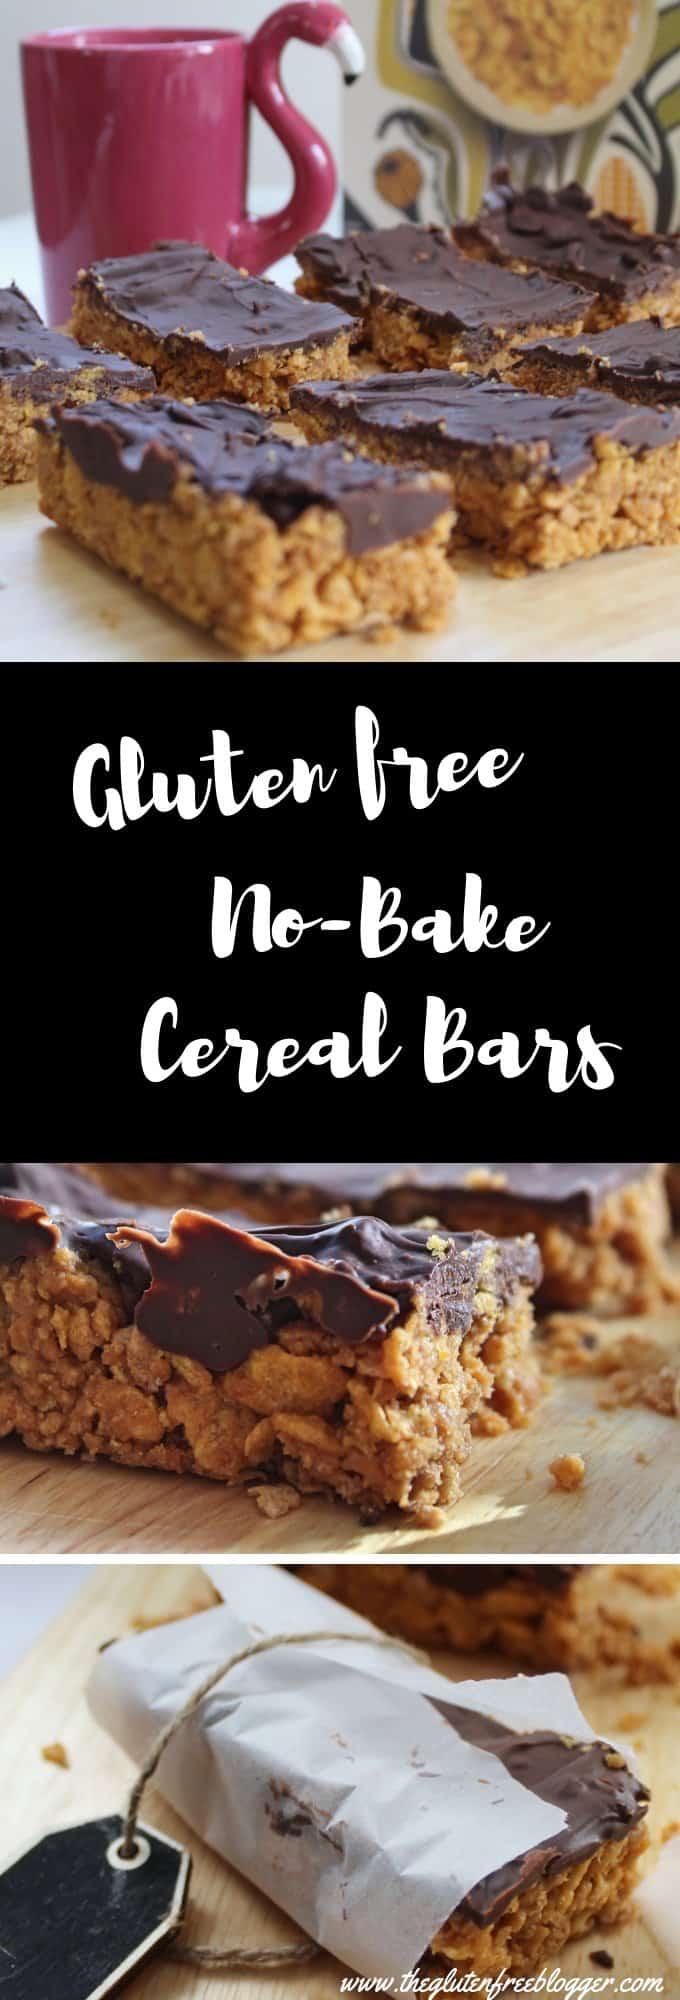 gluten free cereal bars recipe easy no bake snacks coeliac